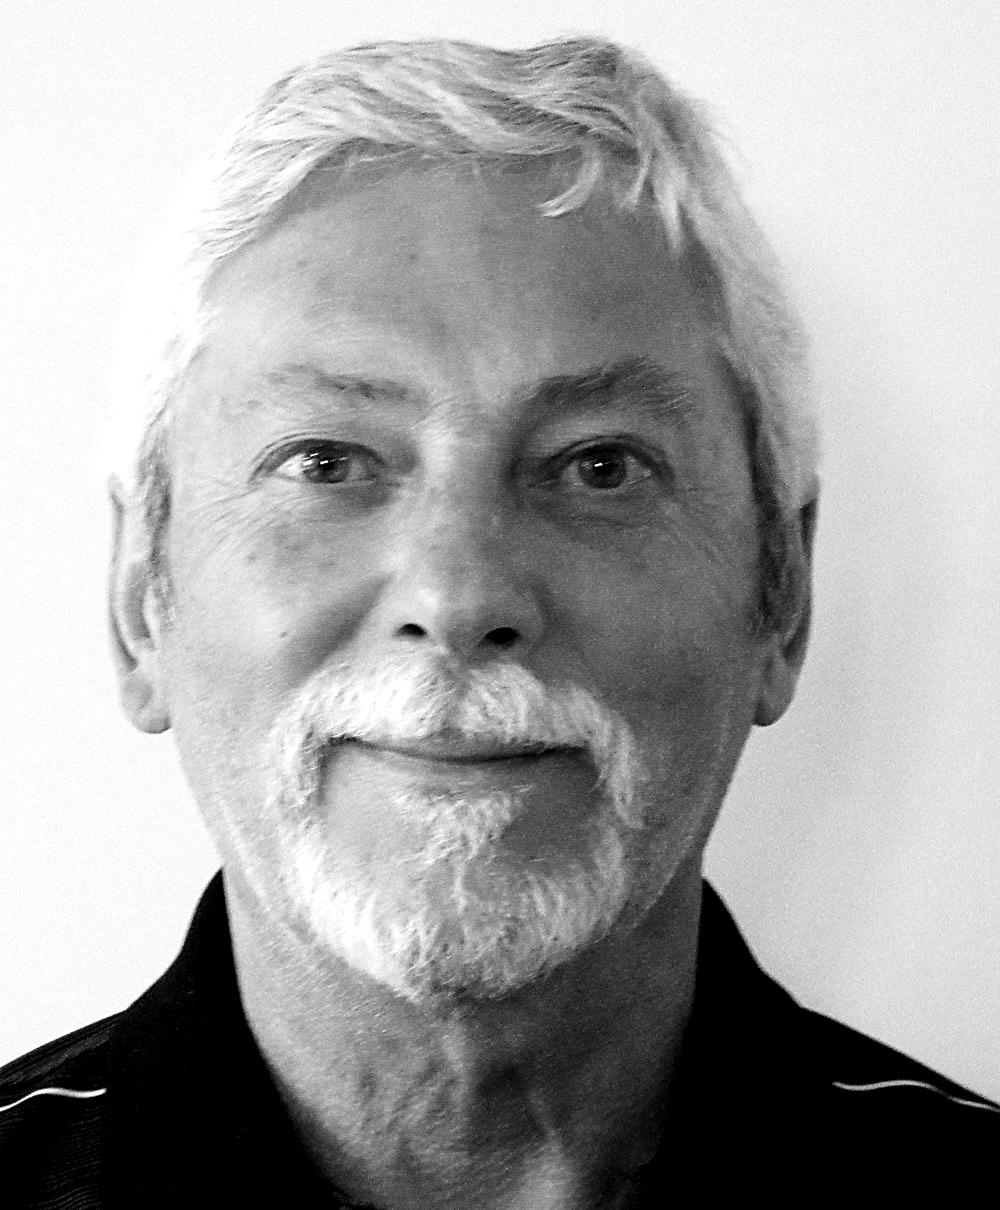 Headshot of Jim Moffatt